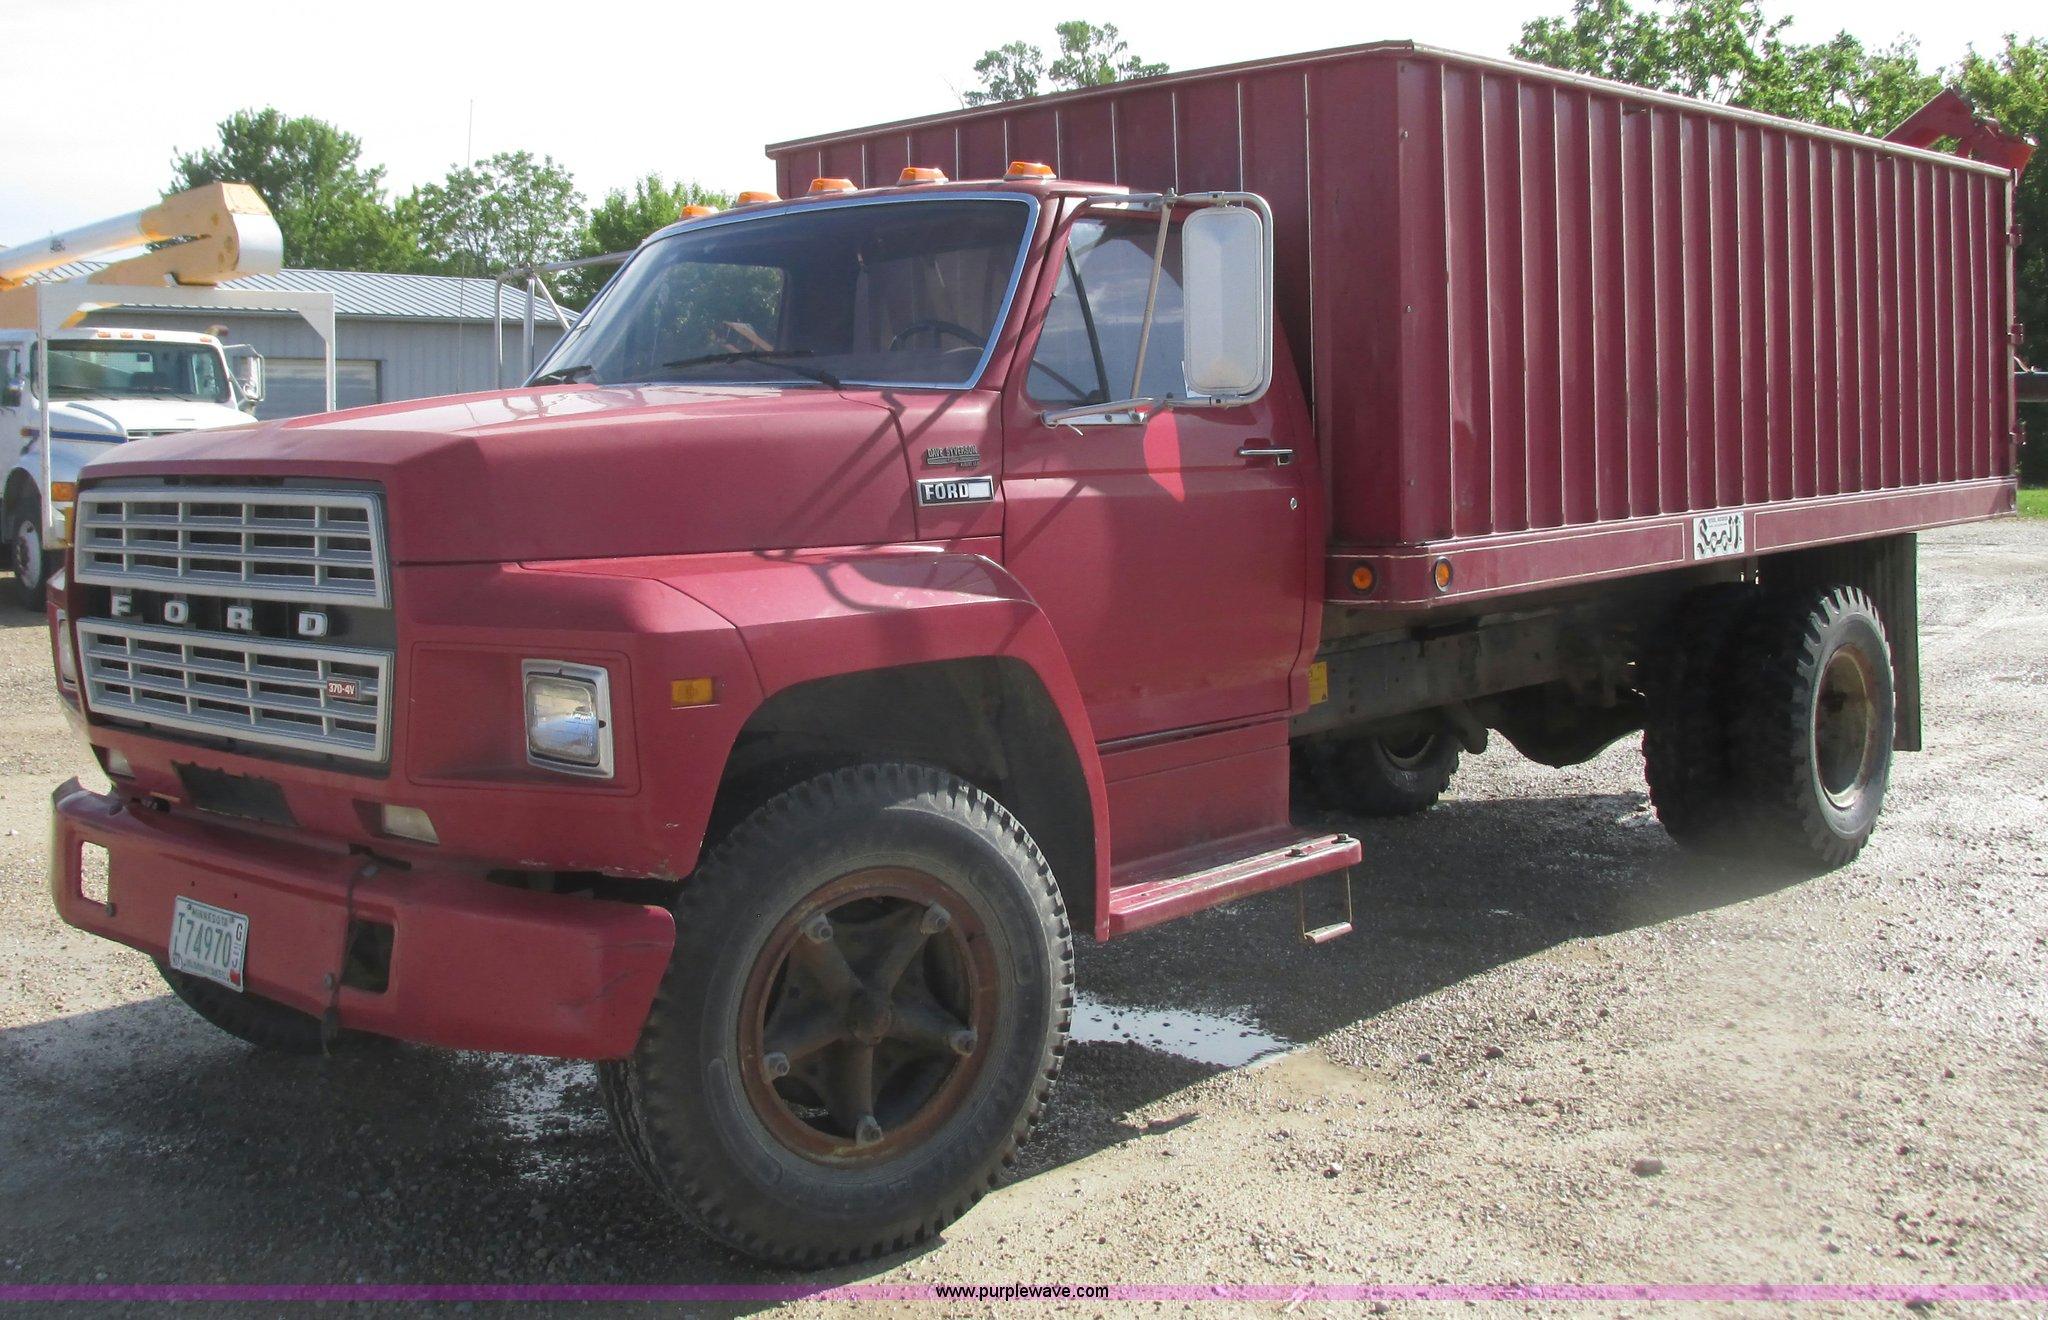 1980 ford grain truck item k4704 sold june 29 ag equipm rh purplewave com 1969 Ford Dump Truck Ford Farm Truck